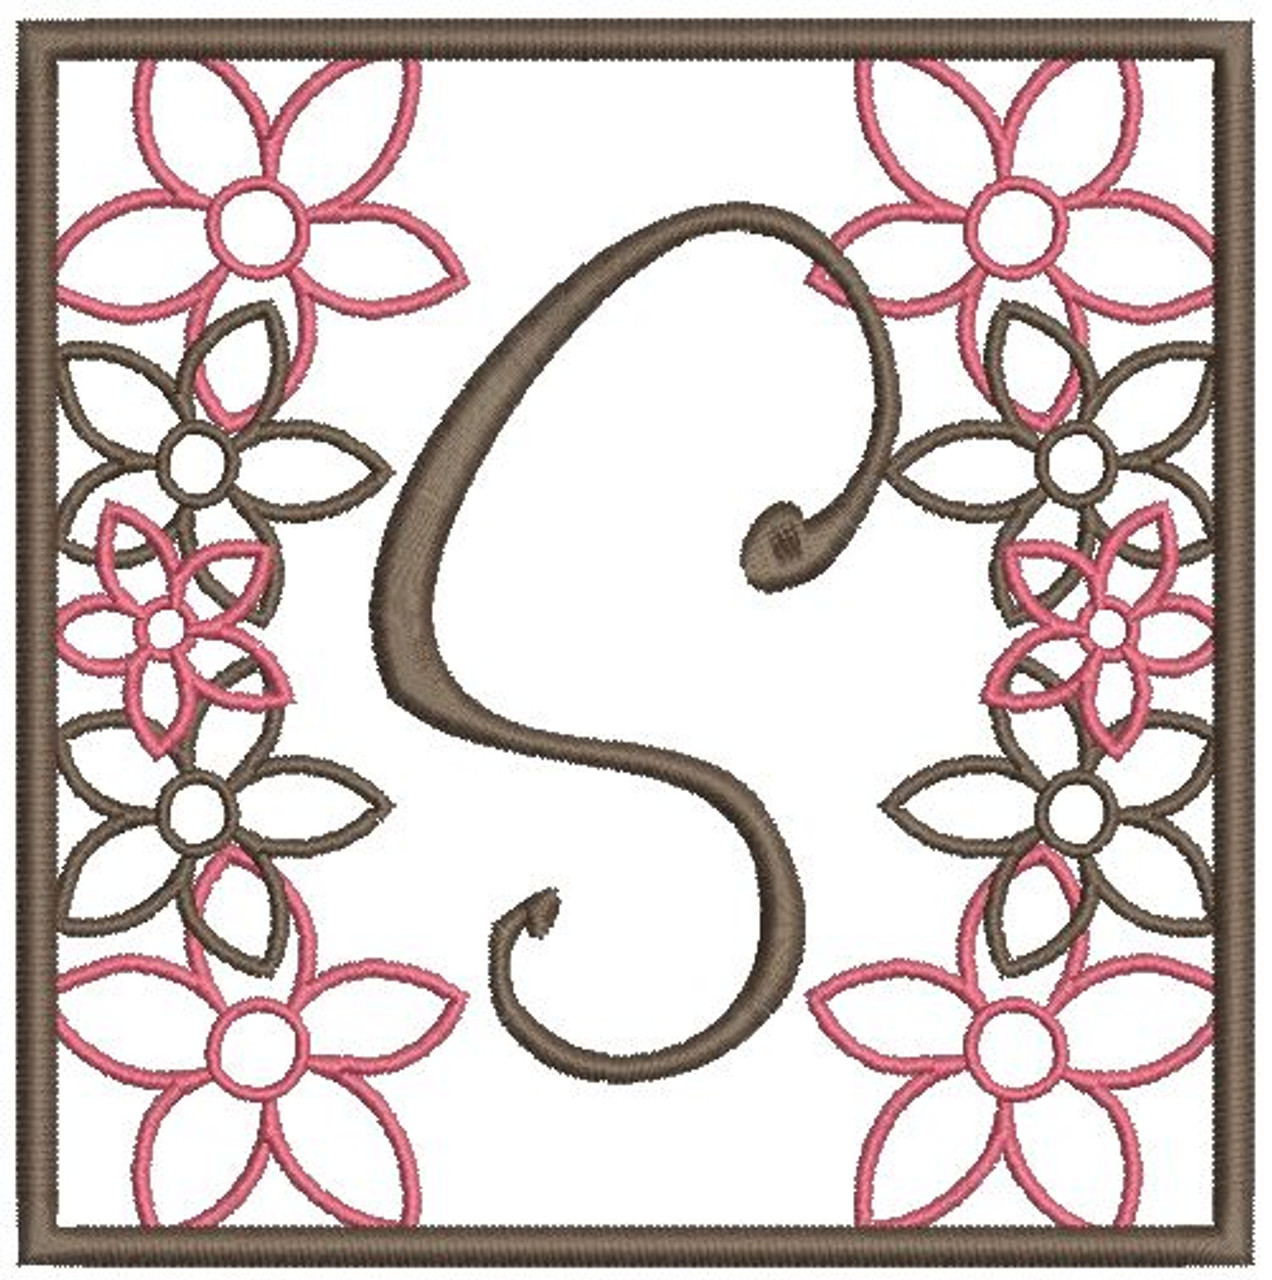 No 23 Flower Font Frames Machine Embroidery Designs